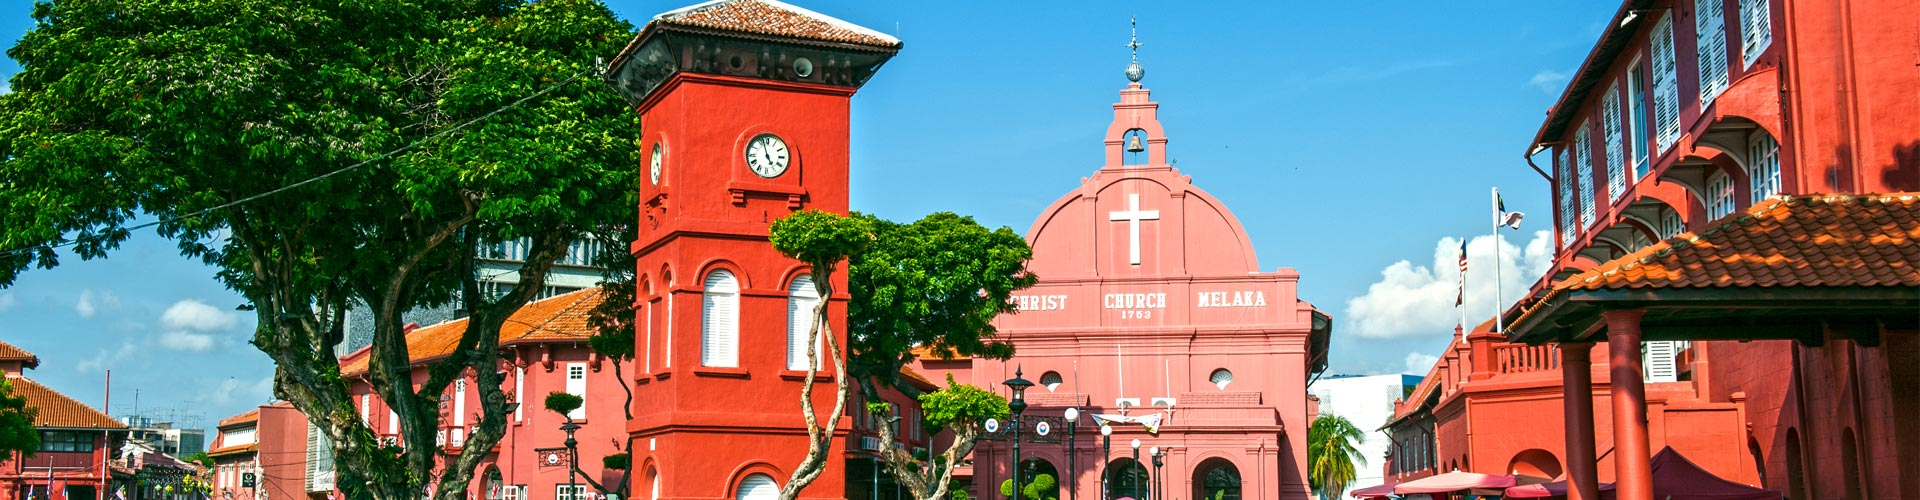 Seremban, Port Dickson, Malacca